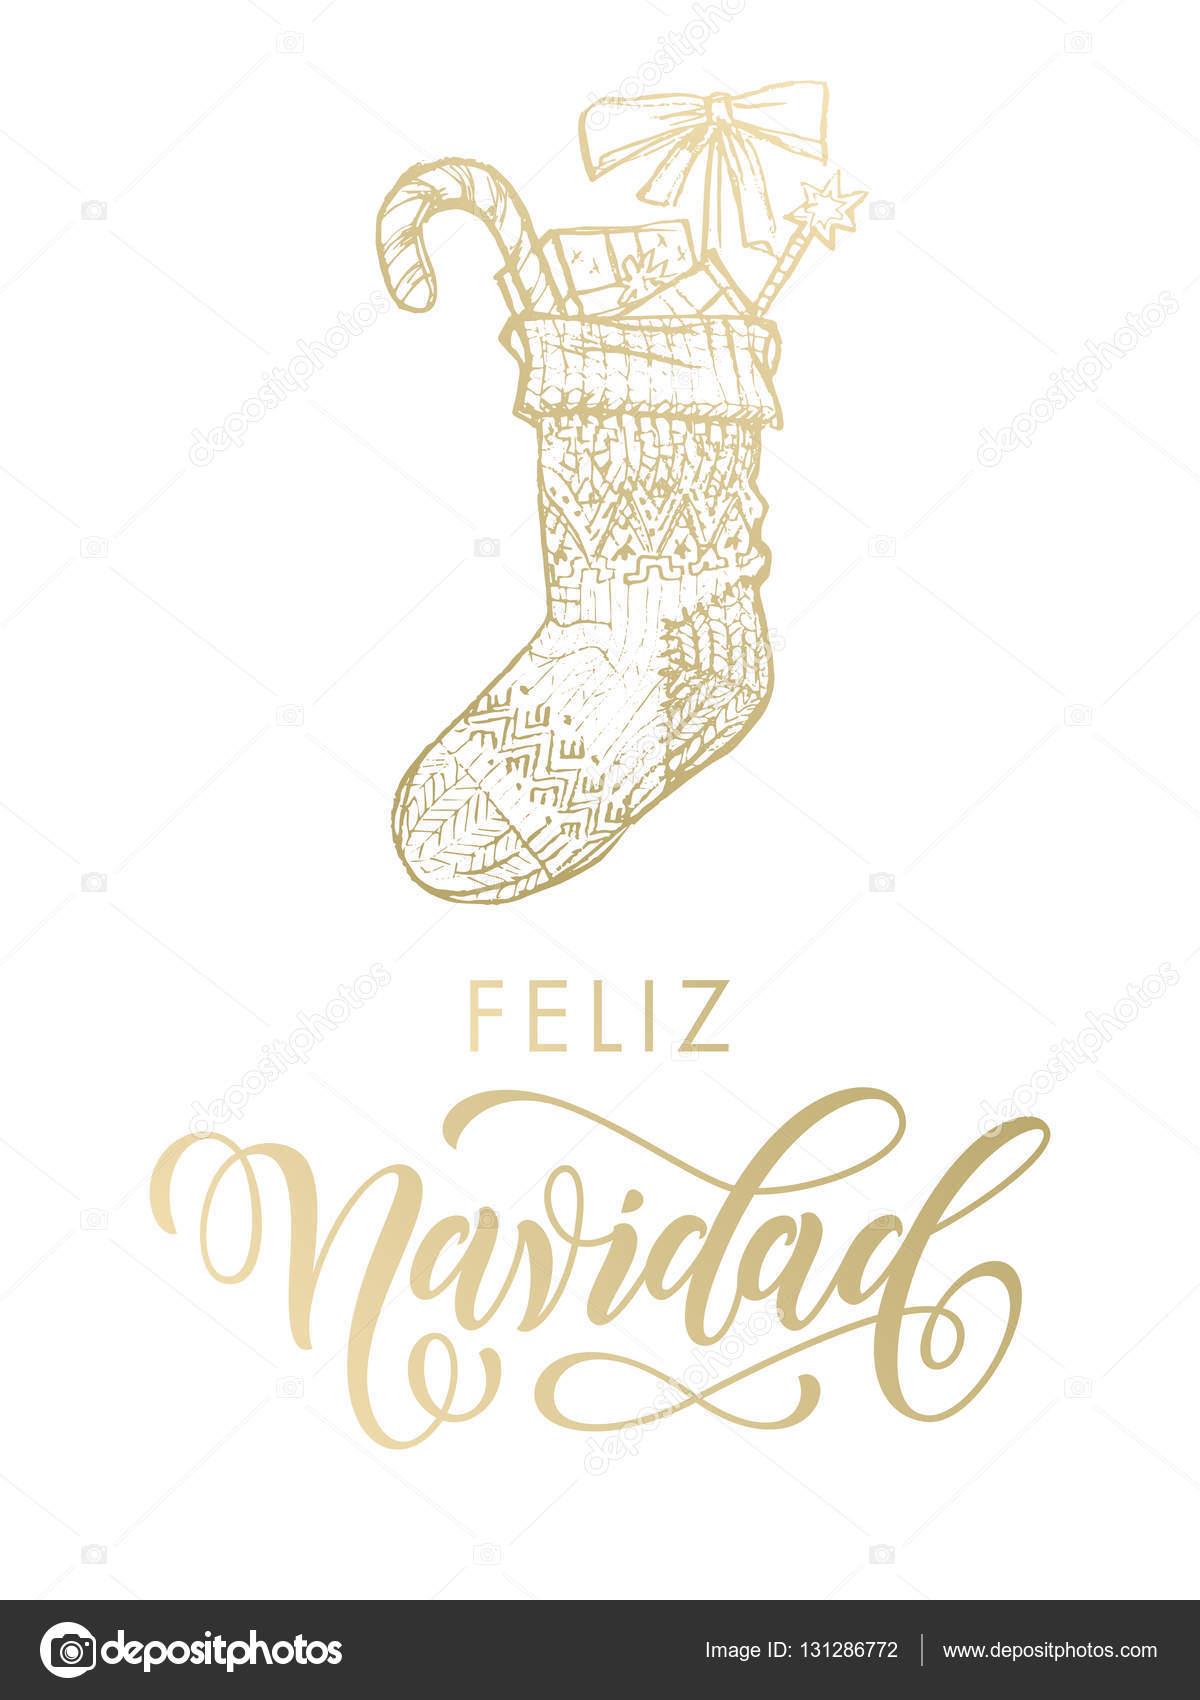 Buon Natale In Spagnolo.Buon Natale In Spagnolo Feliz Navidad Oro Glitter Regalo Calza Grafica Vettoriale C Ronedale 131286772 Depositphotos